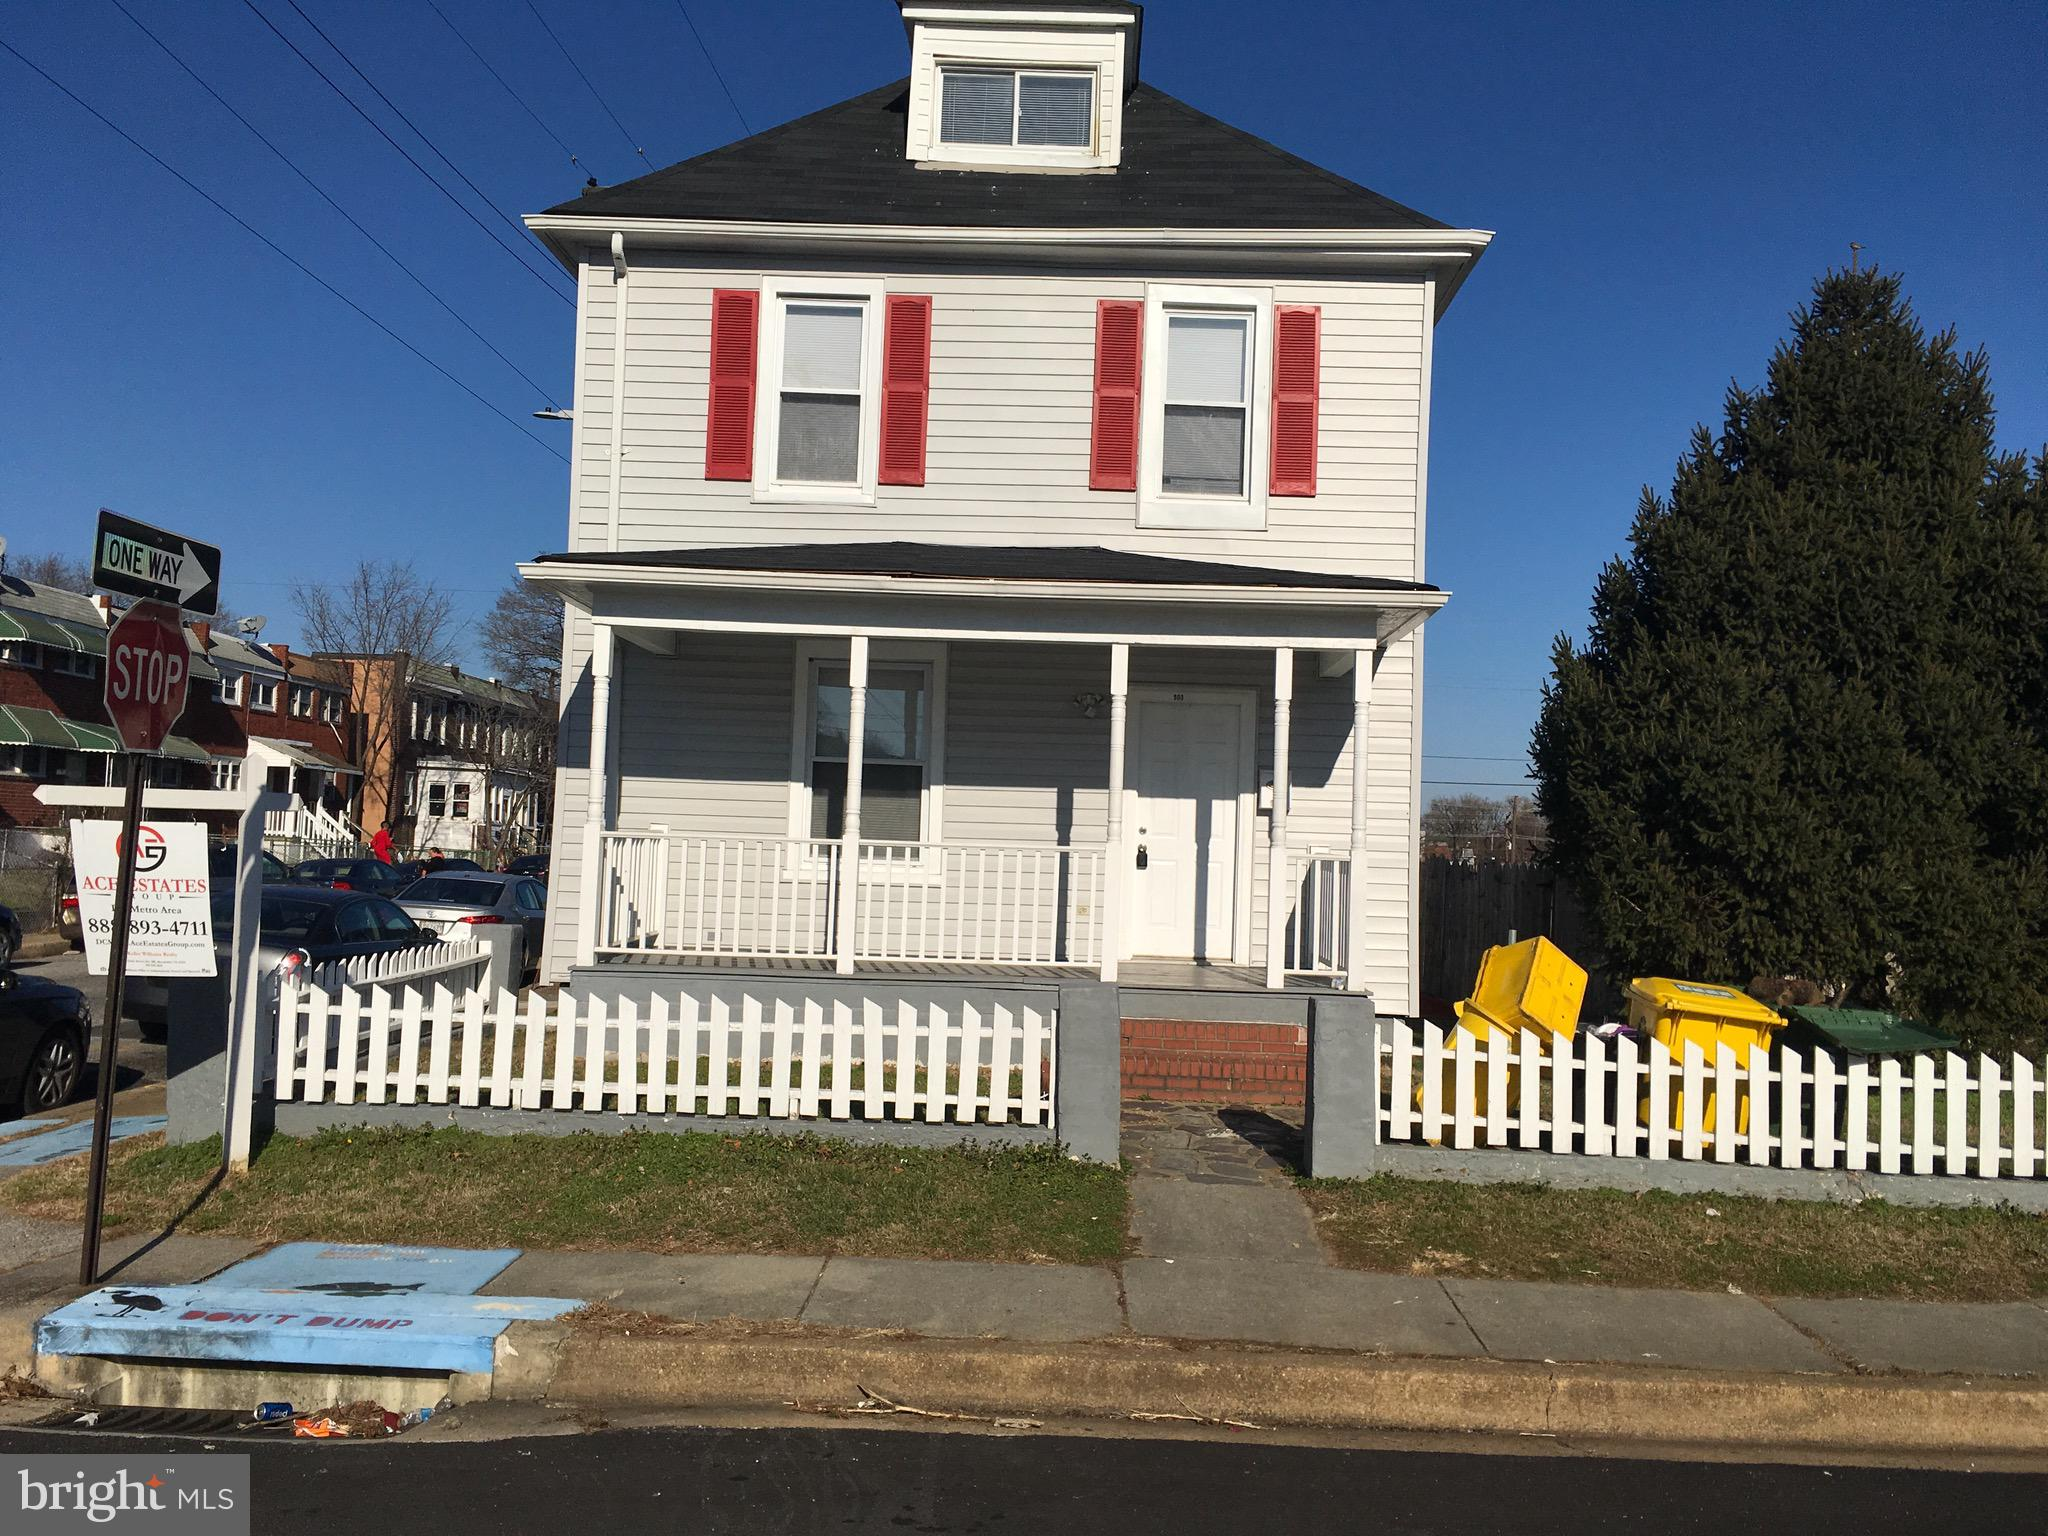 900 Washburn Ave, Baltimore, MD, 21225